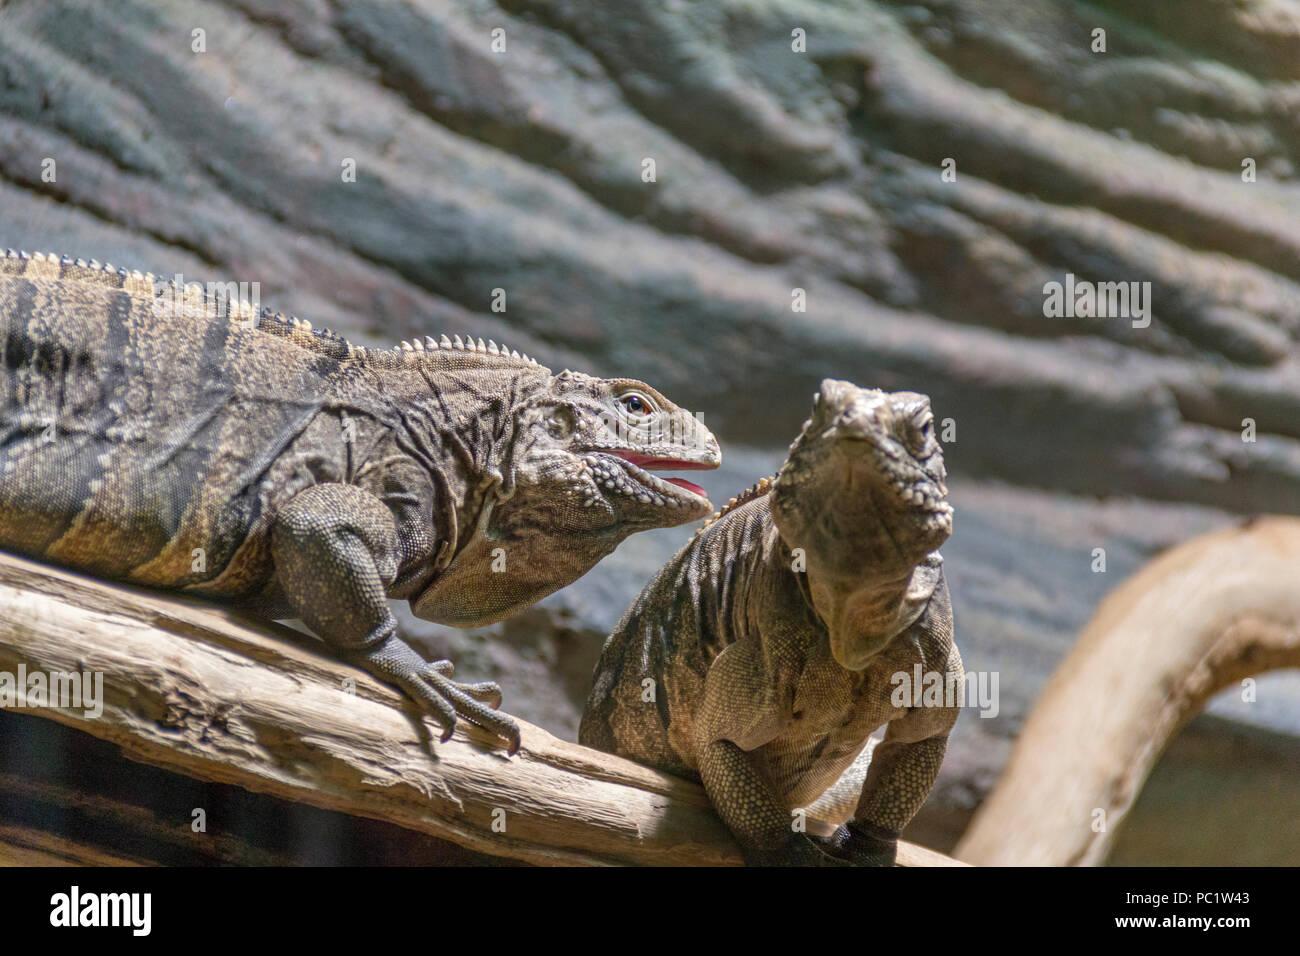 lizards named Cuban rock iguana on tree trunk in stony ground - Stock Image